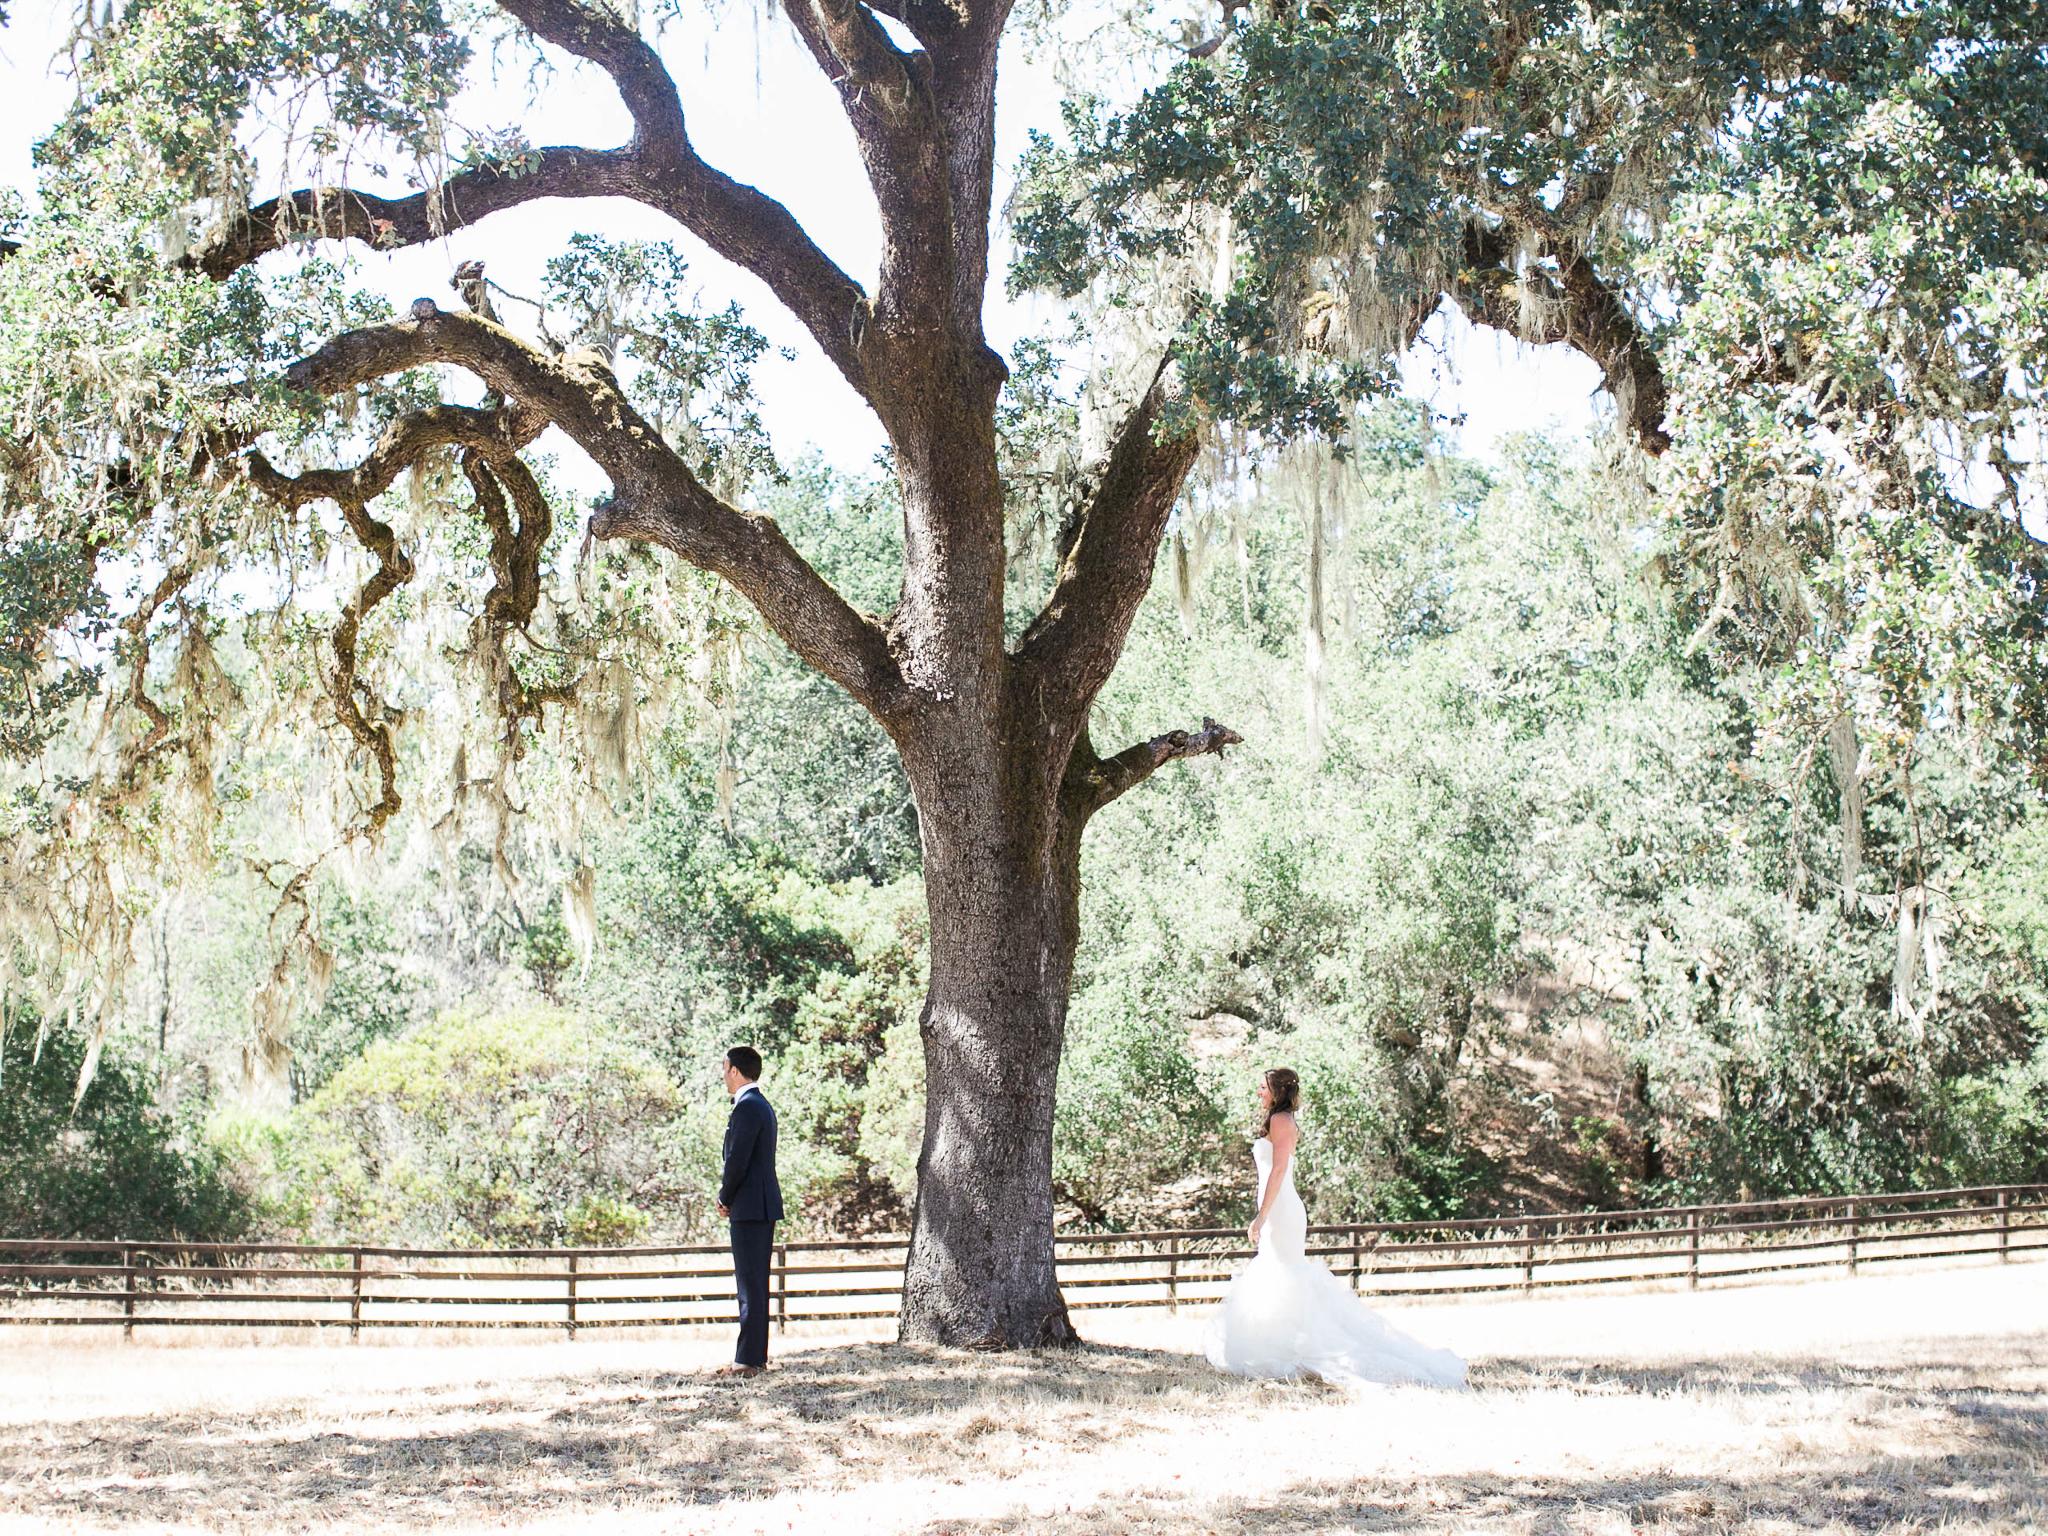 Meghan Mehan Photography - Fine Art Film Wedding Photography - San Francisco   Napa   Sonoma   Big Sur   Chicago   Minneapolis   Milwaukee   Lake Geneva   Door County   Wisconsin 009.jpg